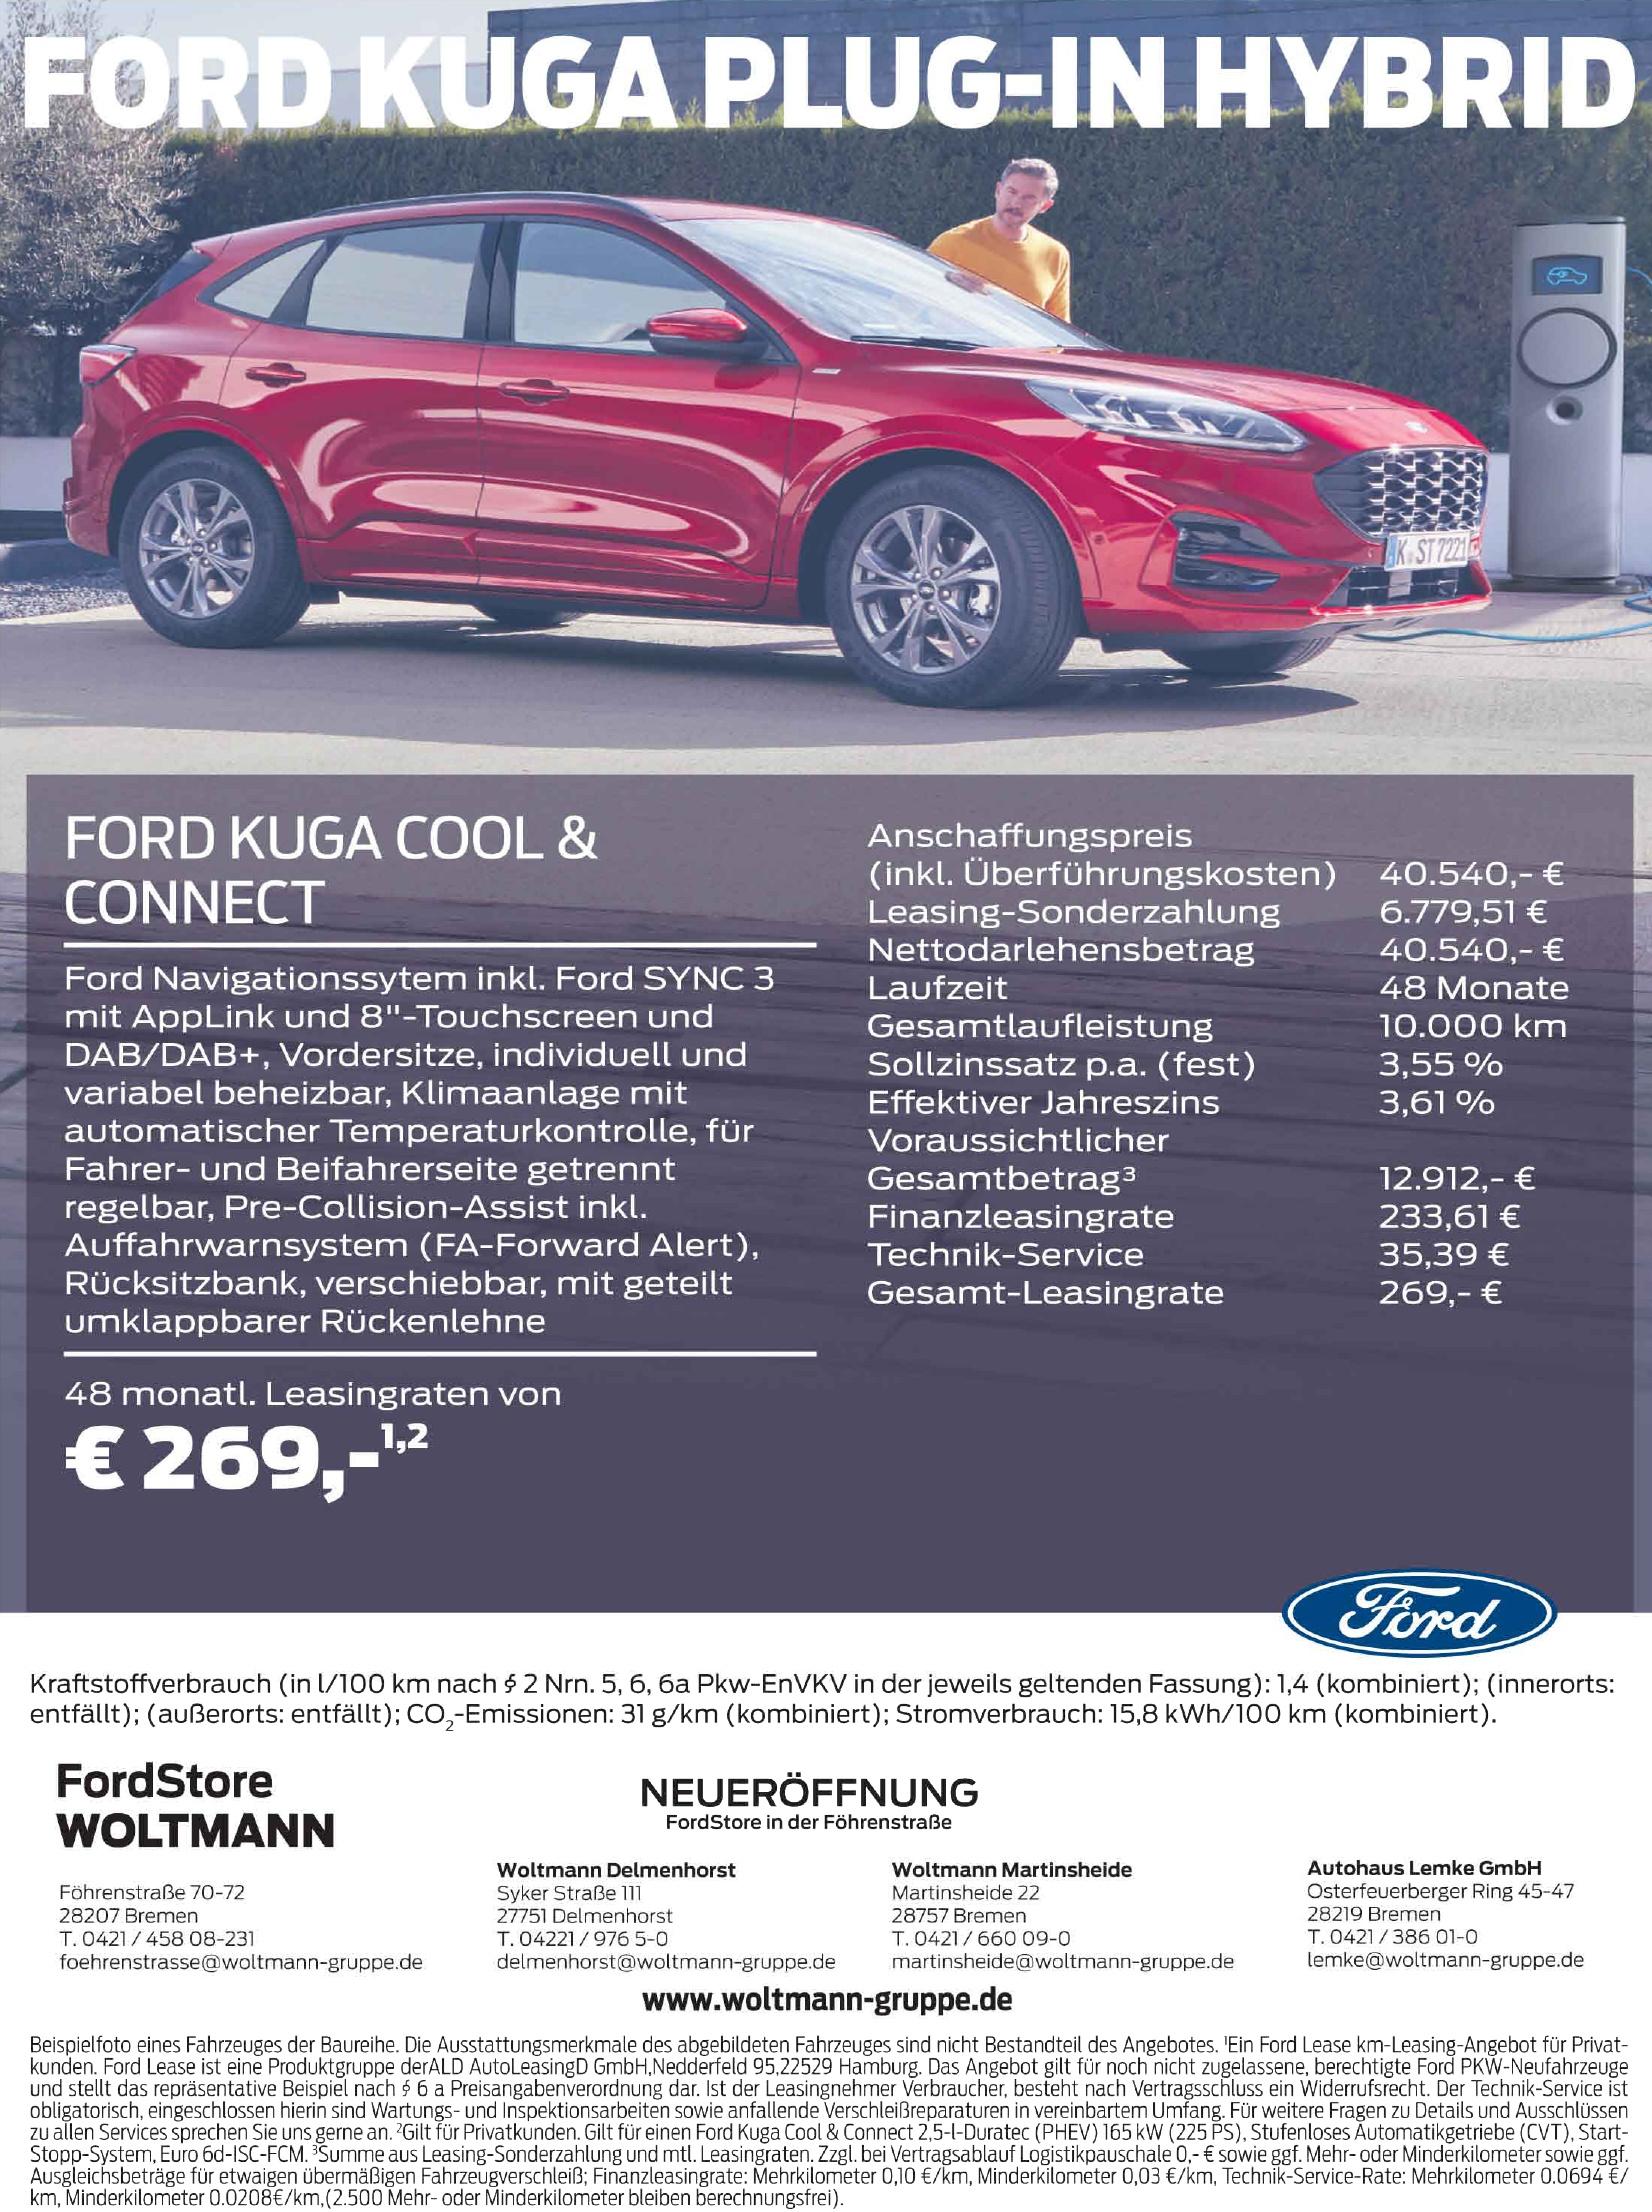 FordStore Woltmann